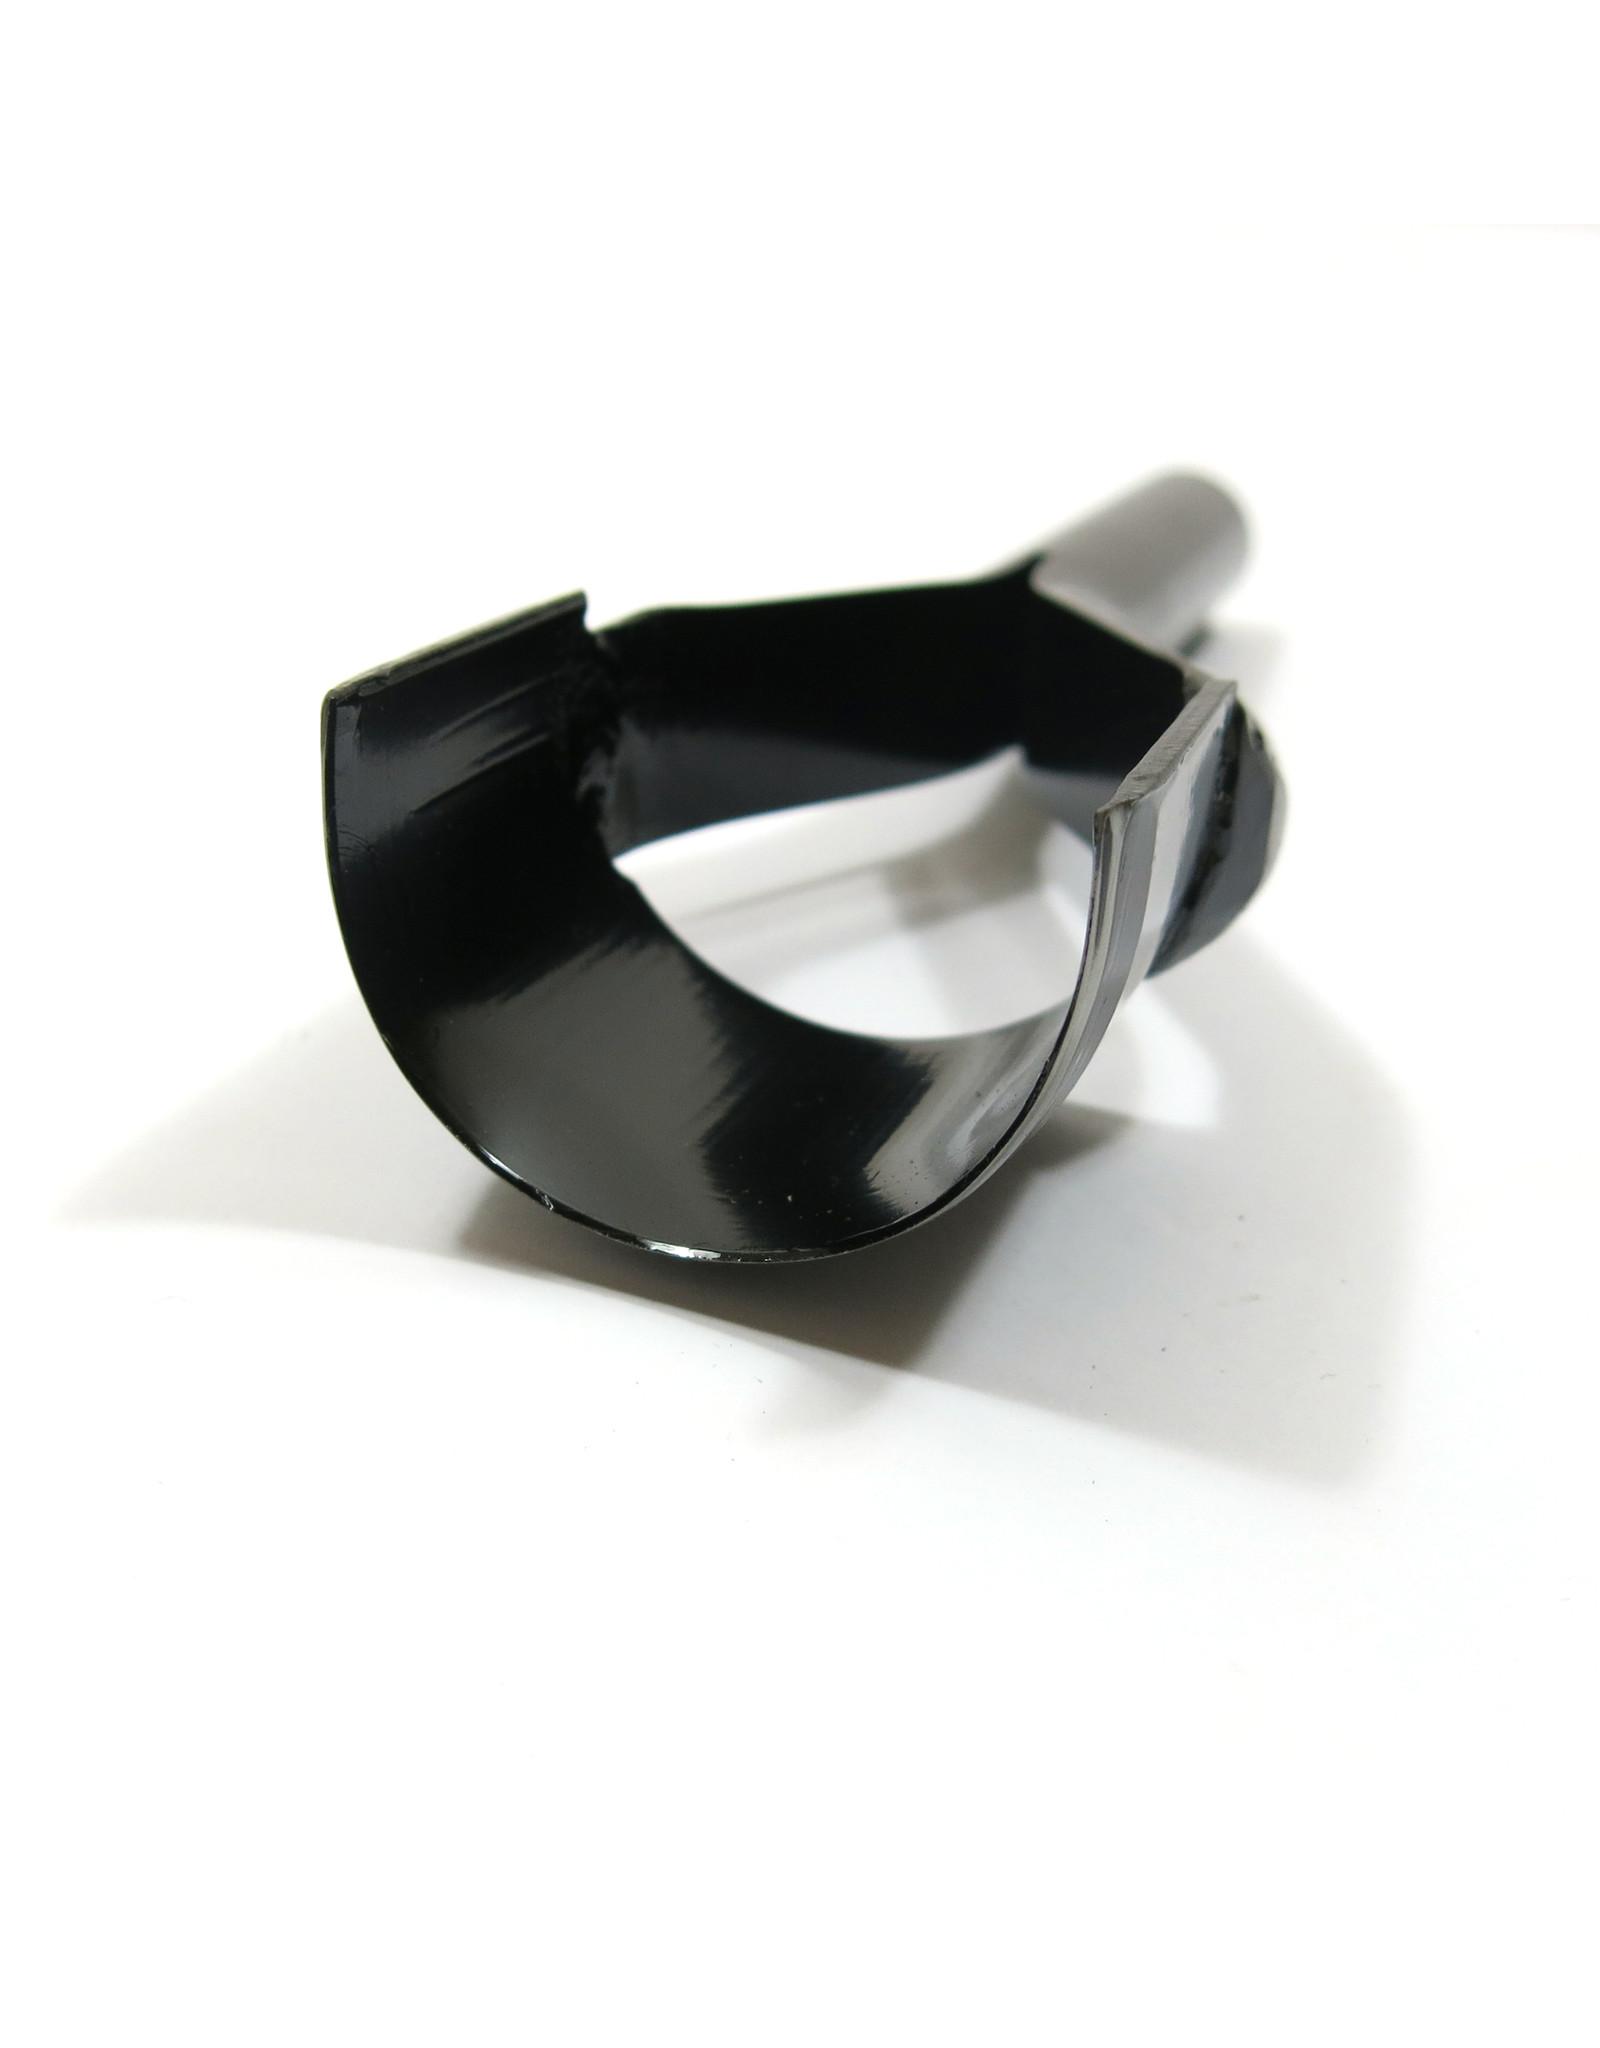 Strap end punch 40mm (round)